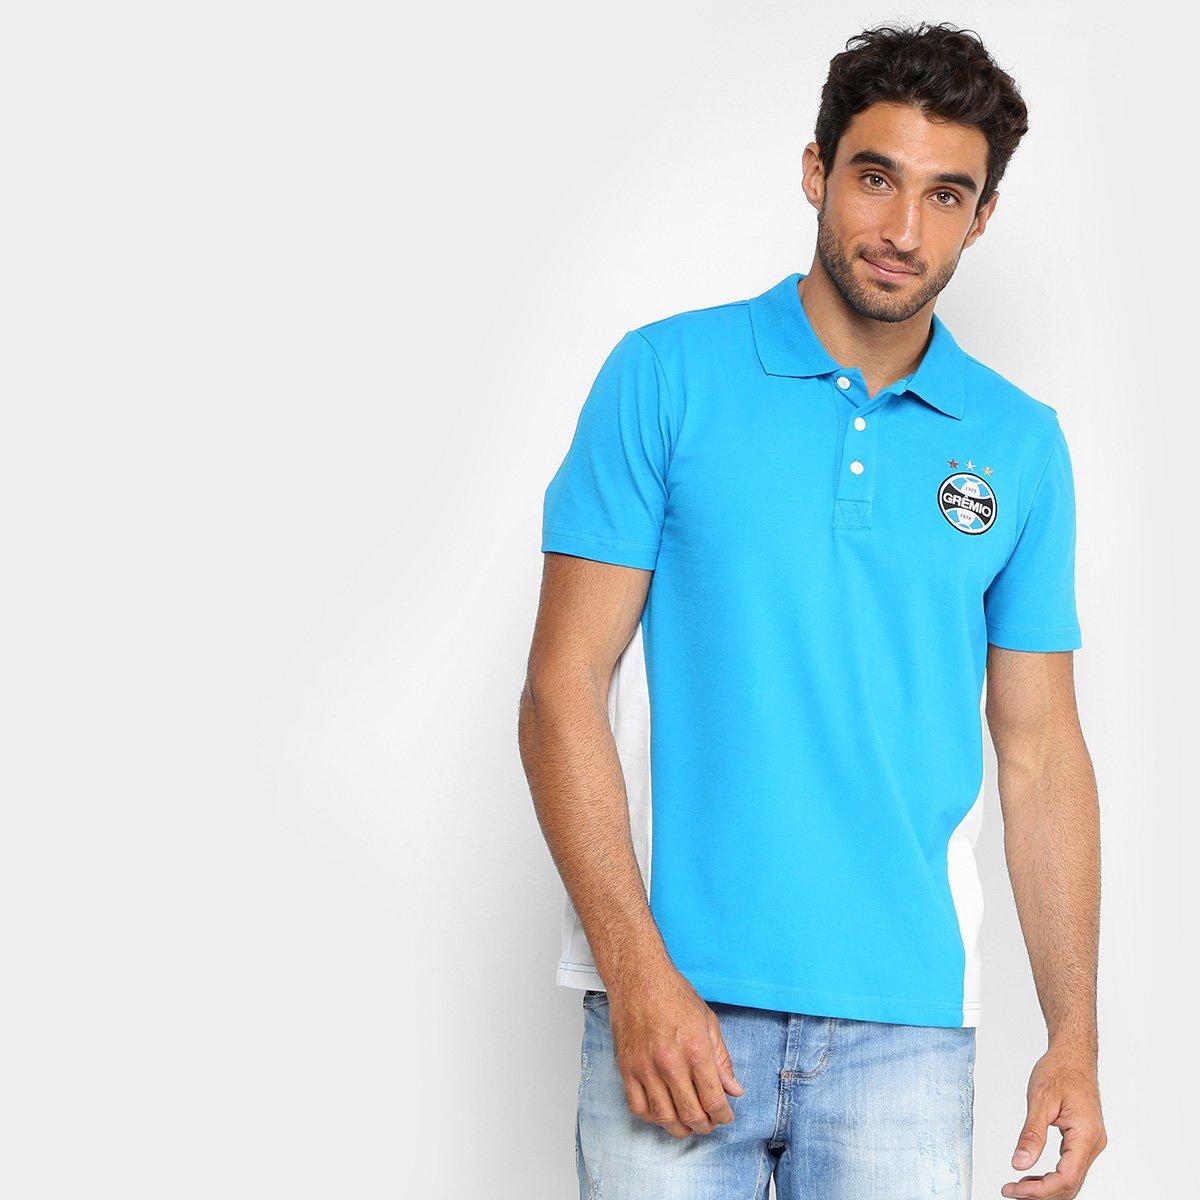 Camisa Polo Grêmio Básica Masculina - Azul